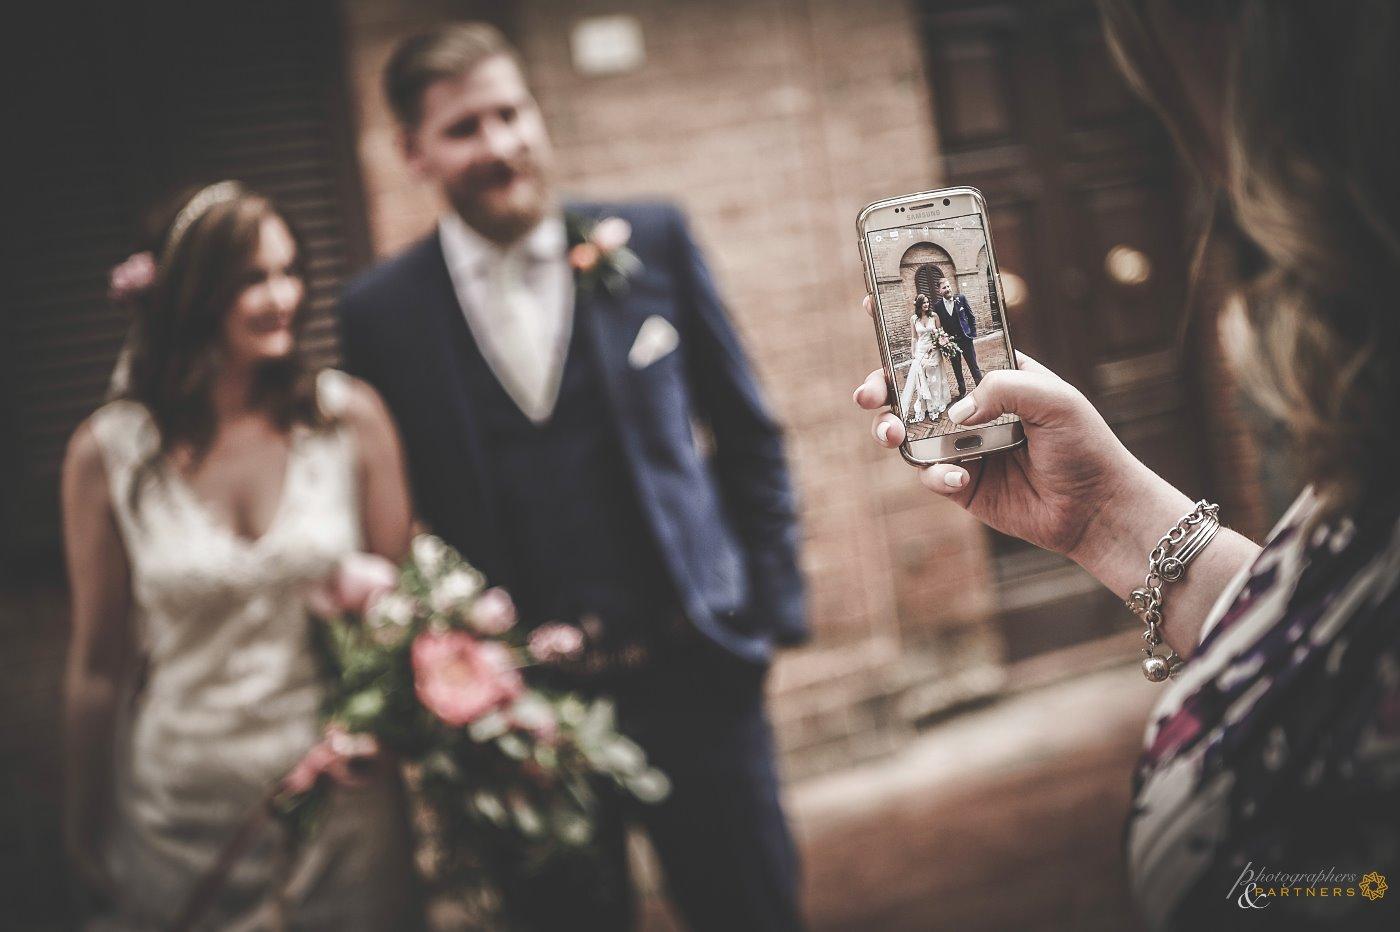 photos_weddings_castello_oliveto_14.jpg